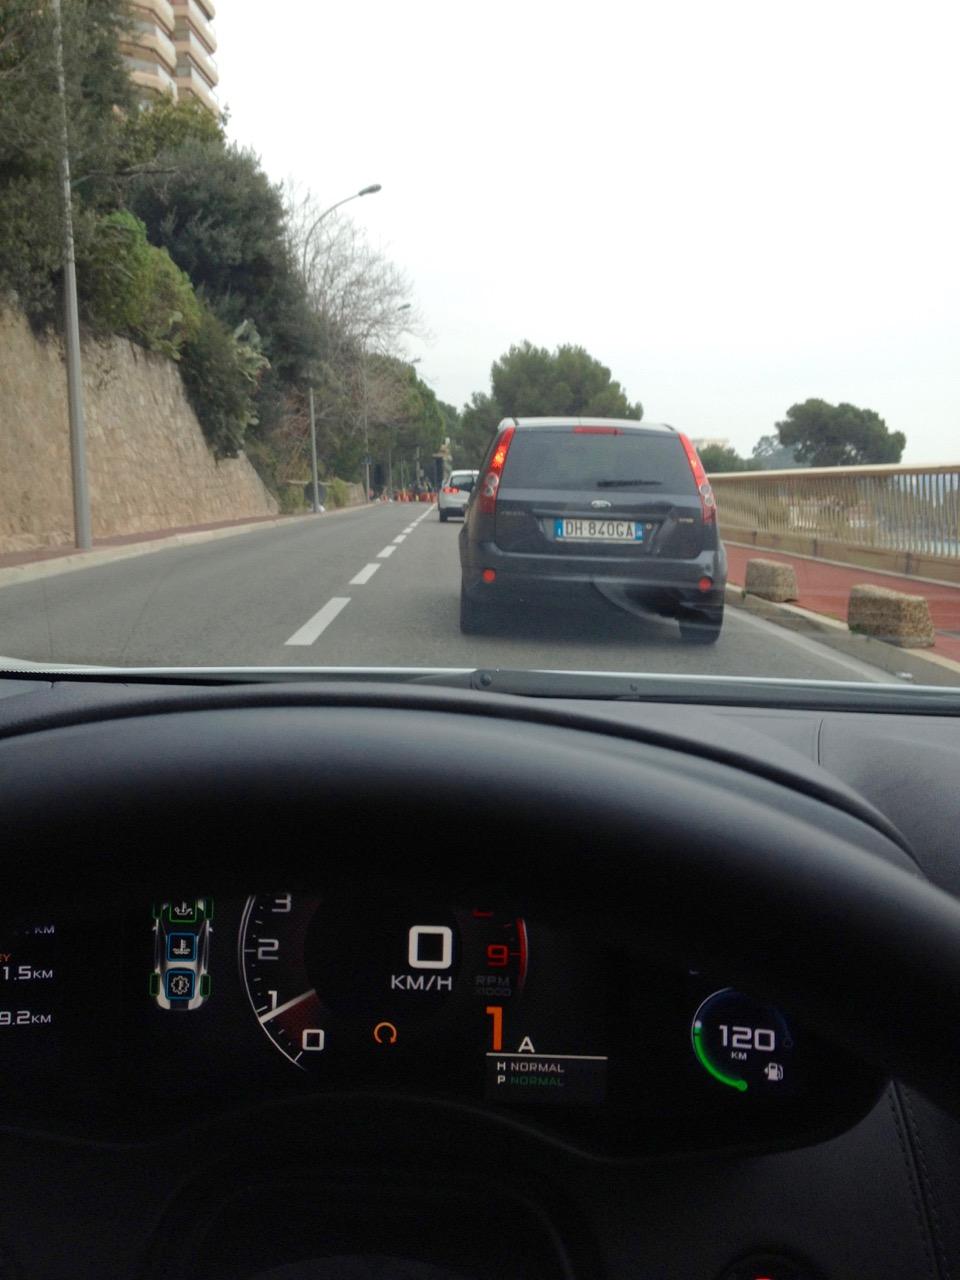 Mclaren 570S - McLaren Monaco